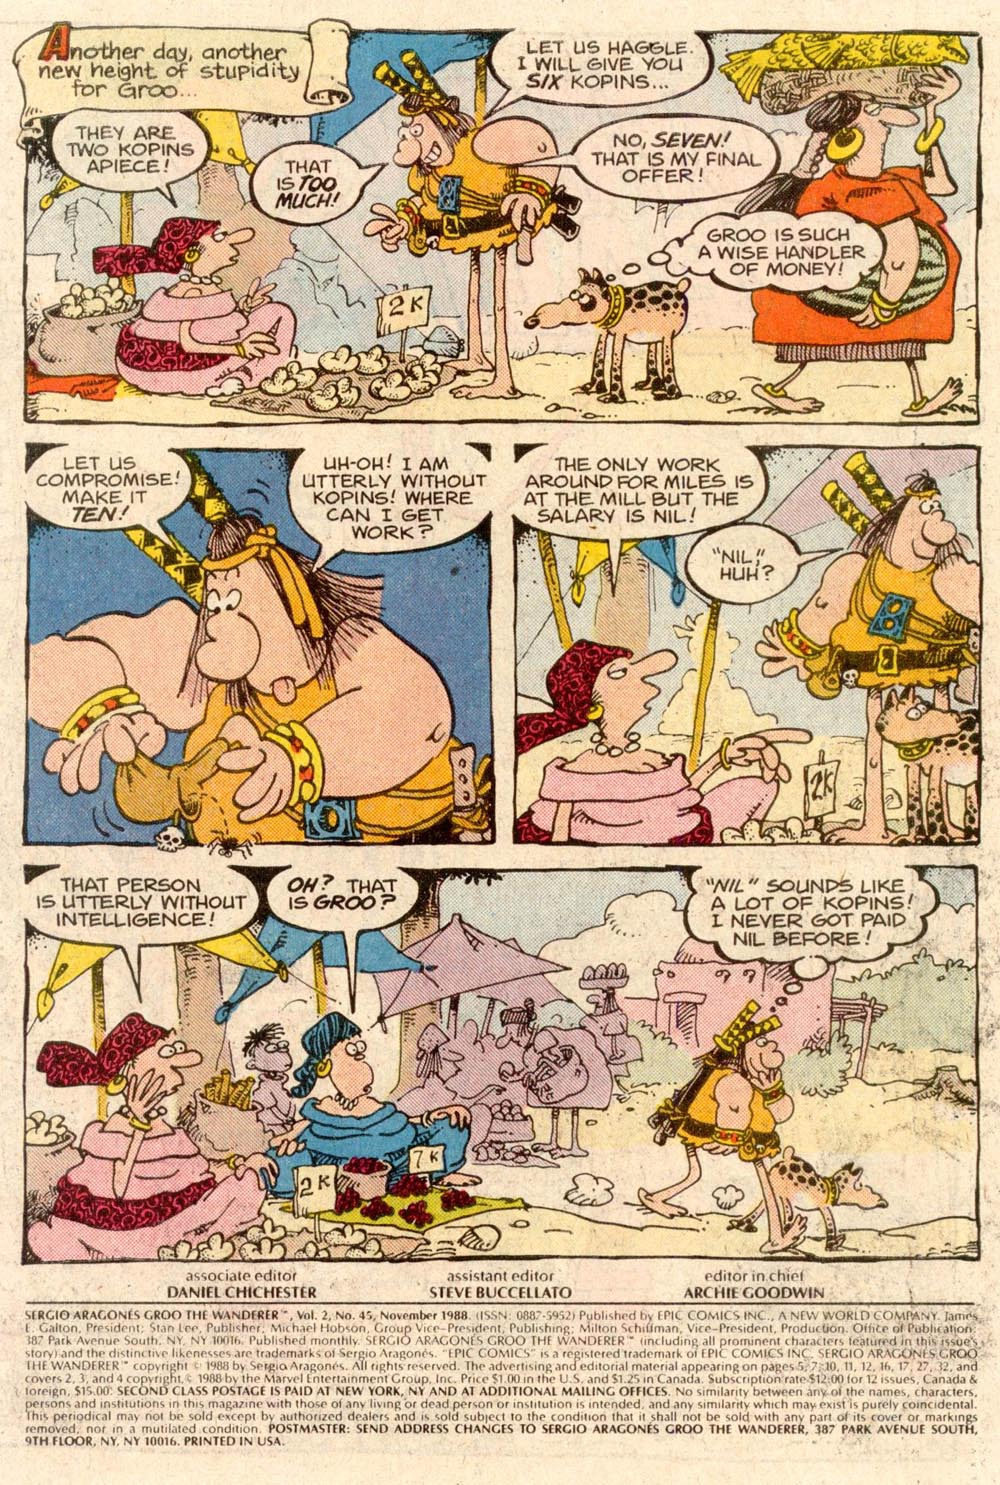 Read online Sergio Aragonés Groo the Wanderer comic -  Issue #45 - 2